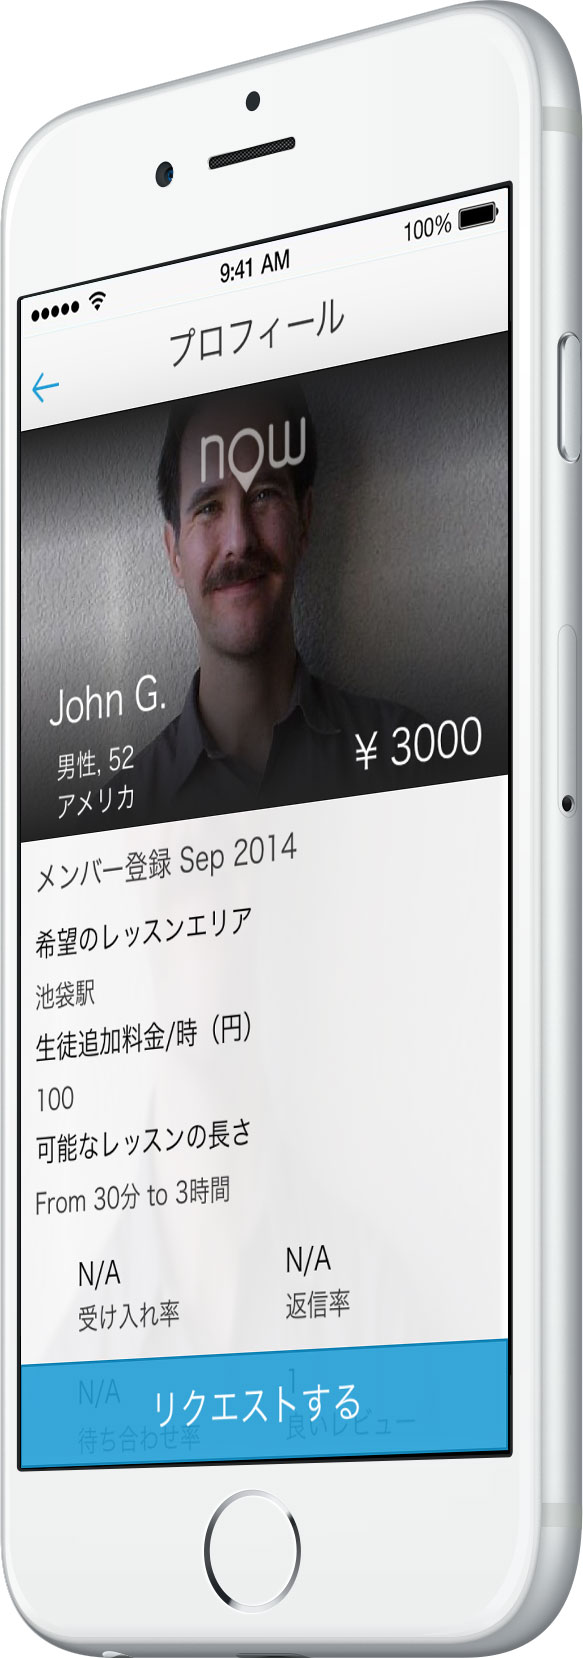 teacher_John.jpg